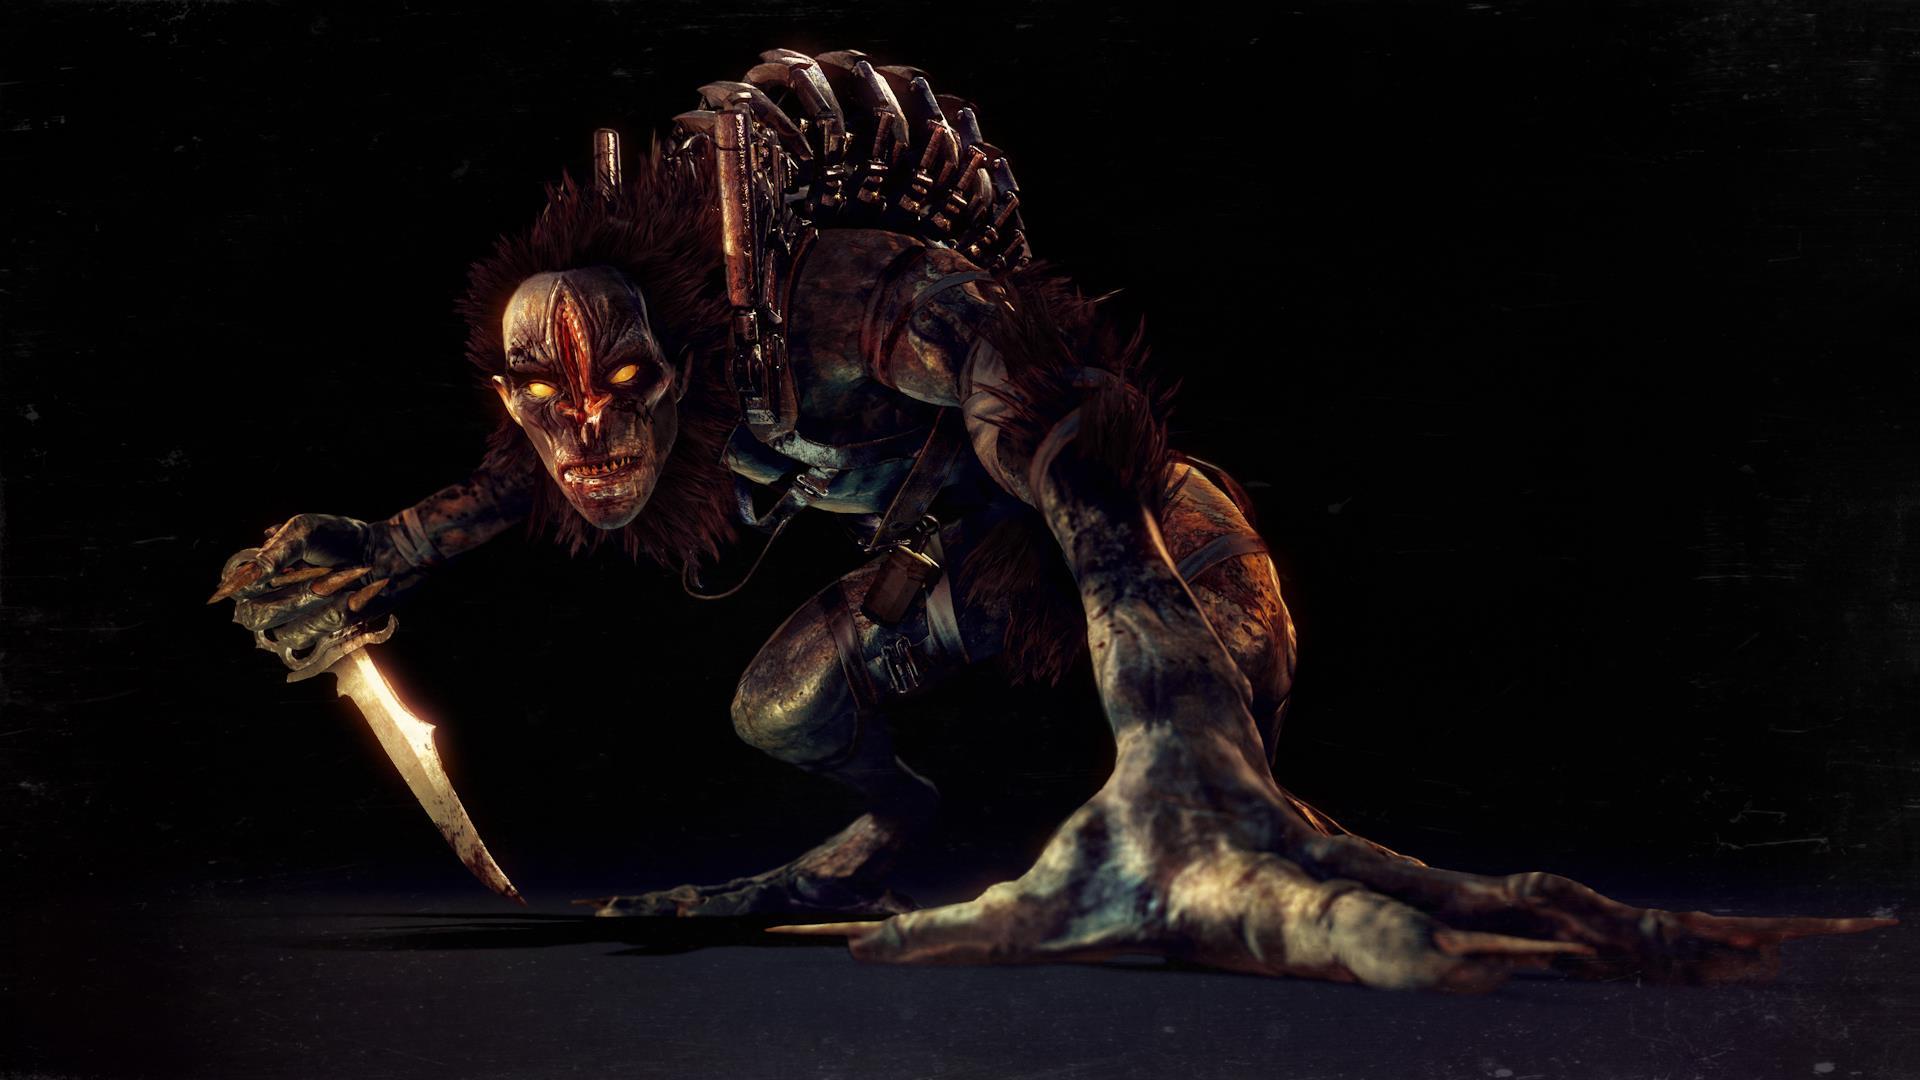 Image dante devil trigger dmc jpg devil may cry wiki fandom - The Hunter Dmc Jpg